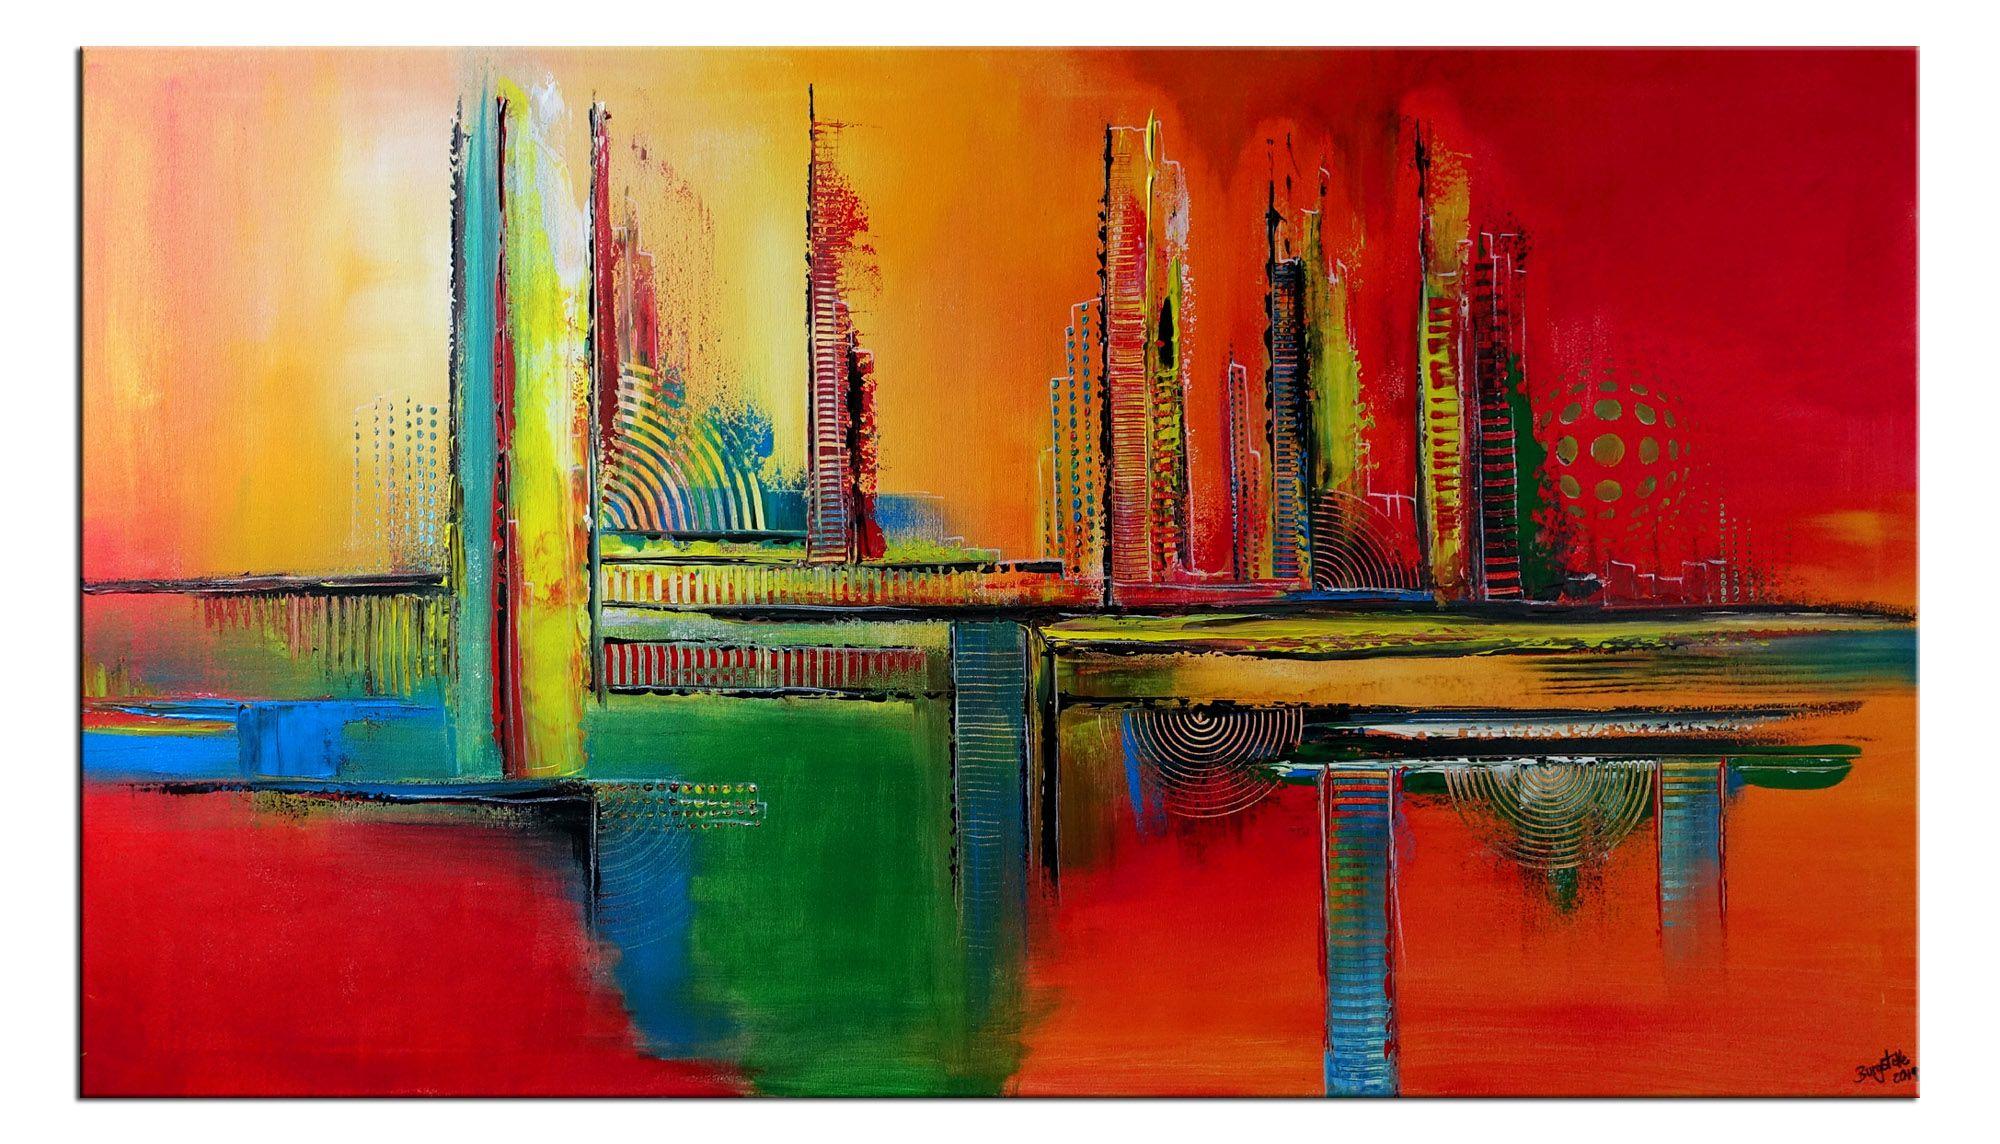 abstrakte kunst malerei acryl gemalde rot gelb abstrakt moderne landschaftsmalerei ölbilder modern